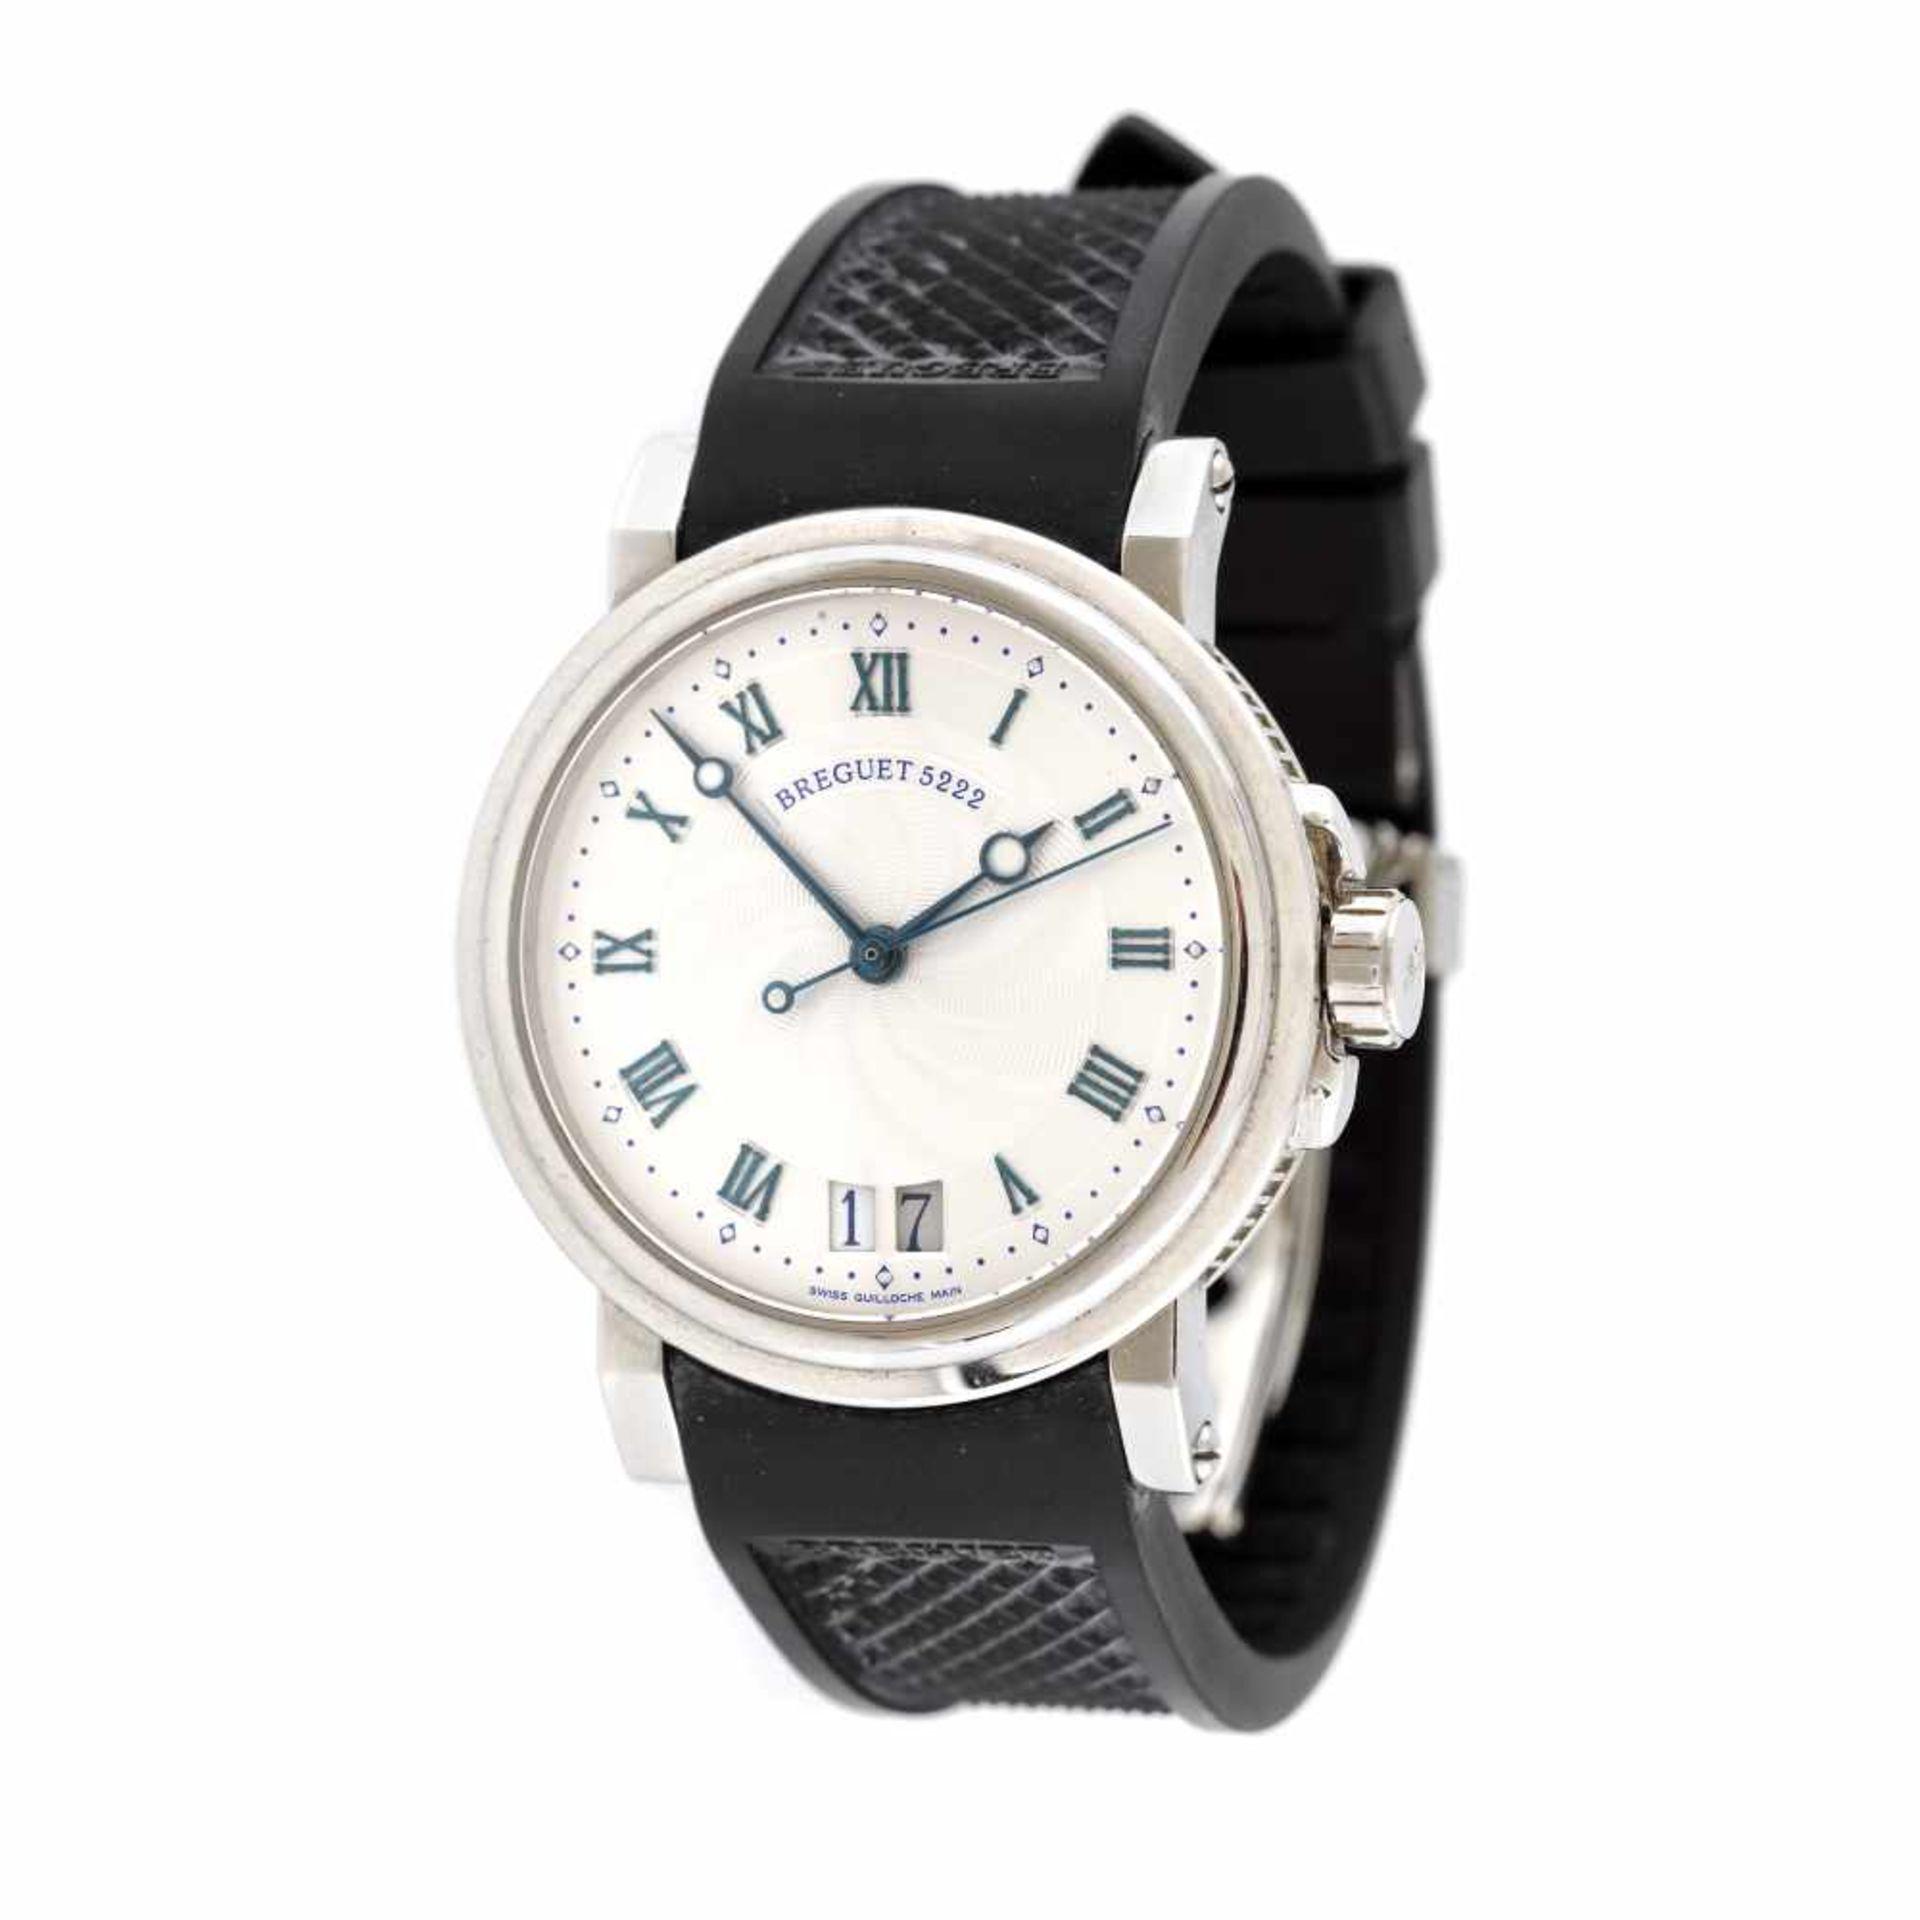 Breguet Marine wristwatch, men, provenance documents